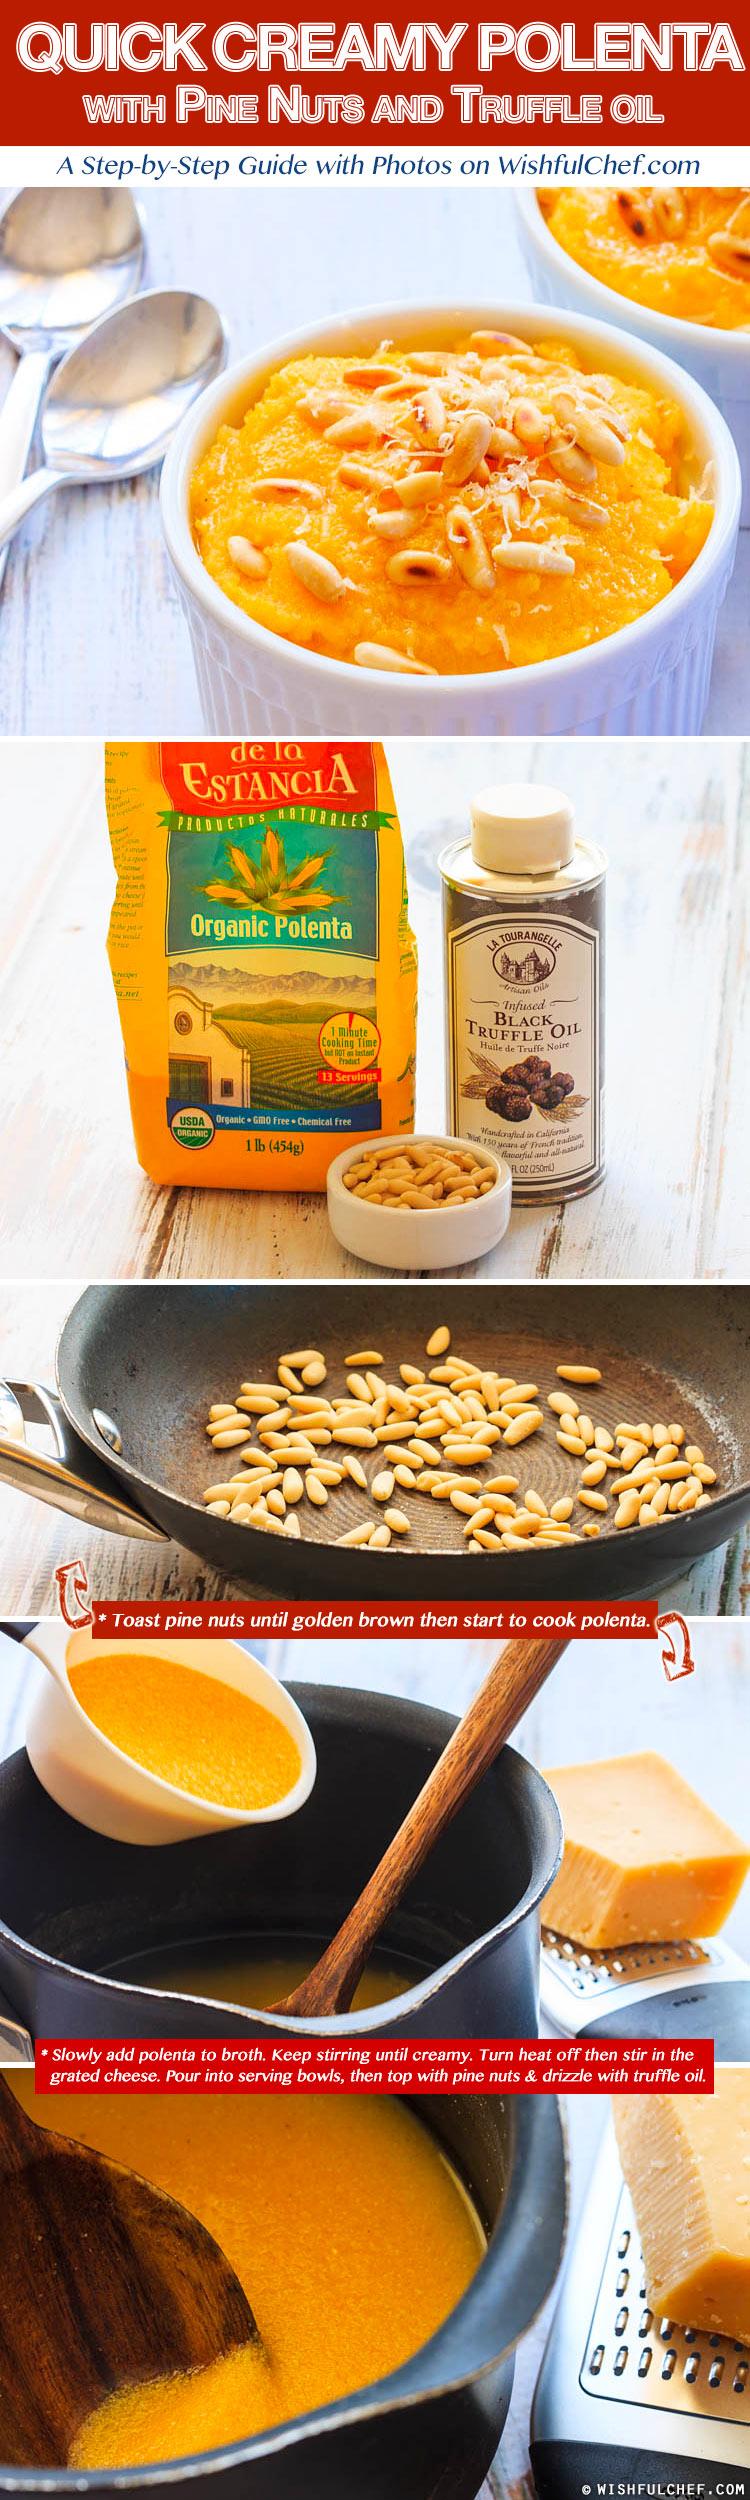 Polenta Pine Nuts Truffle Oil